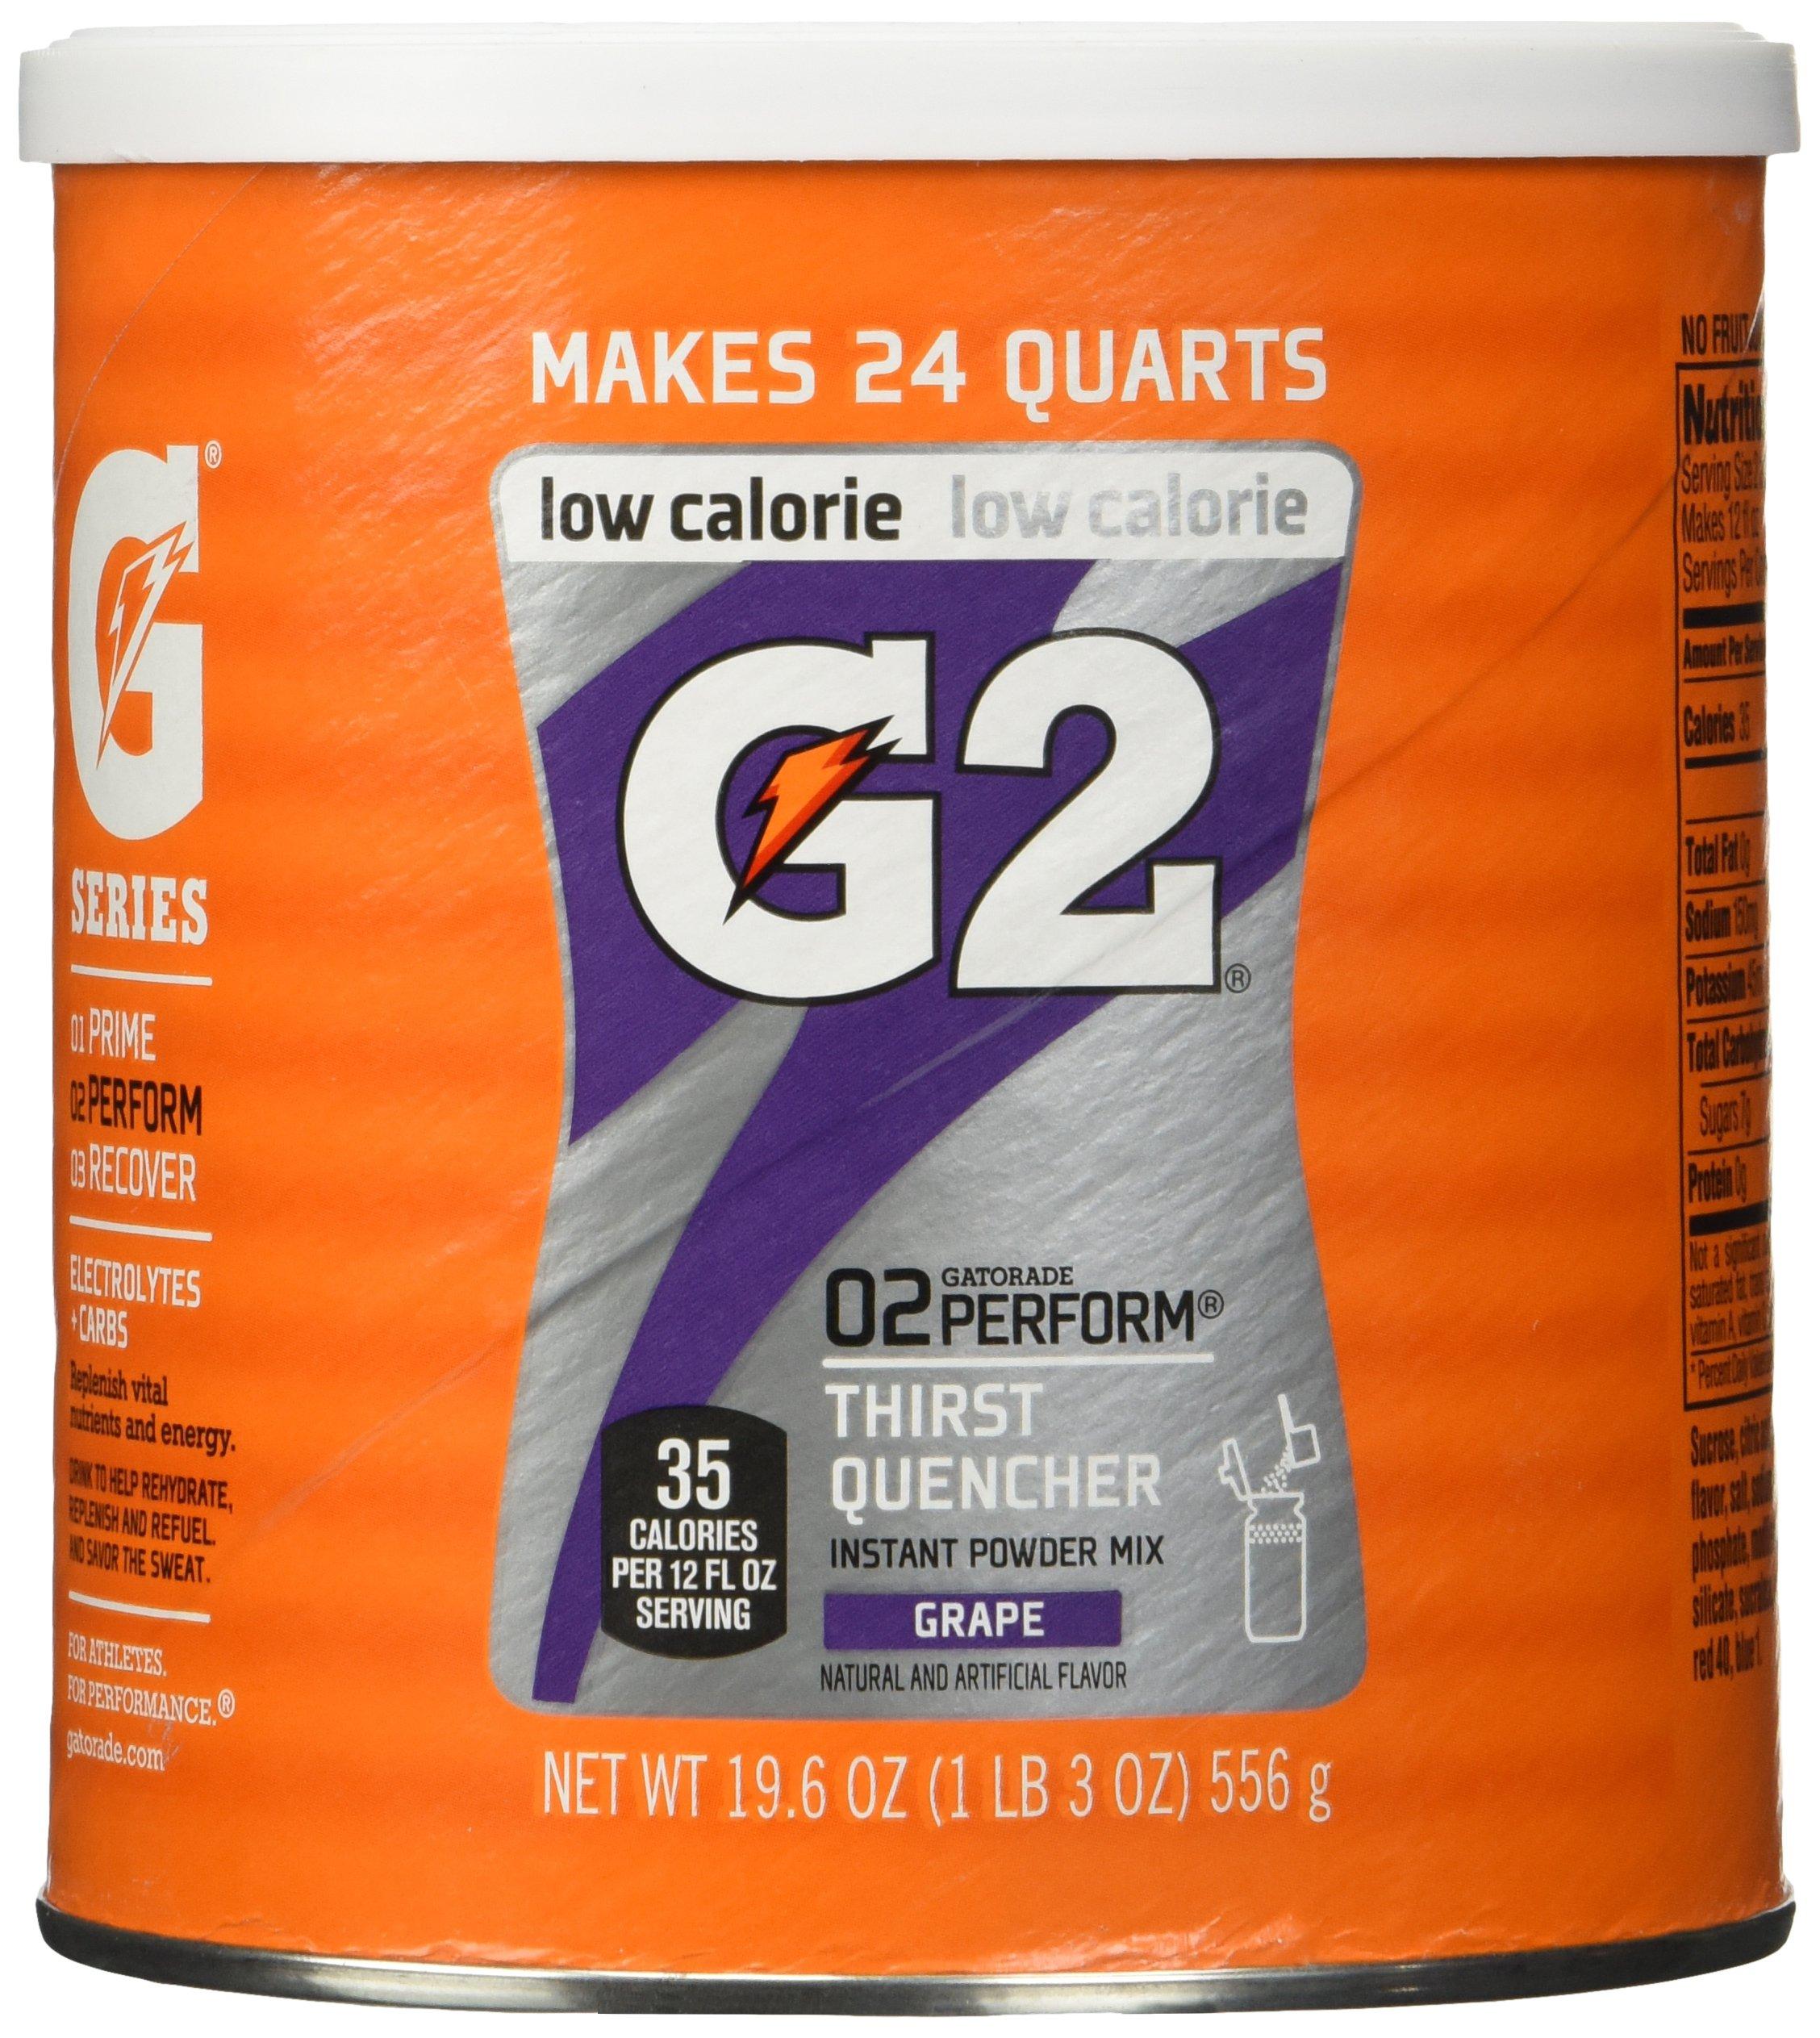 Gatorade Towels Amazon: Amazon.com : Gatorade Perform G2 02 Perform Thirst